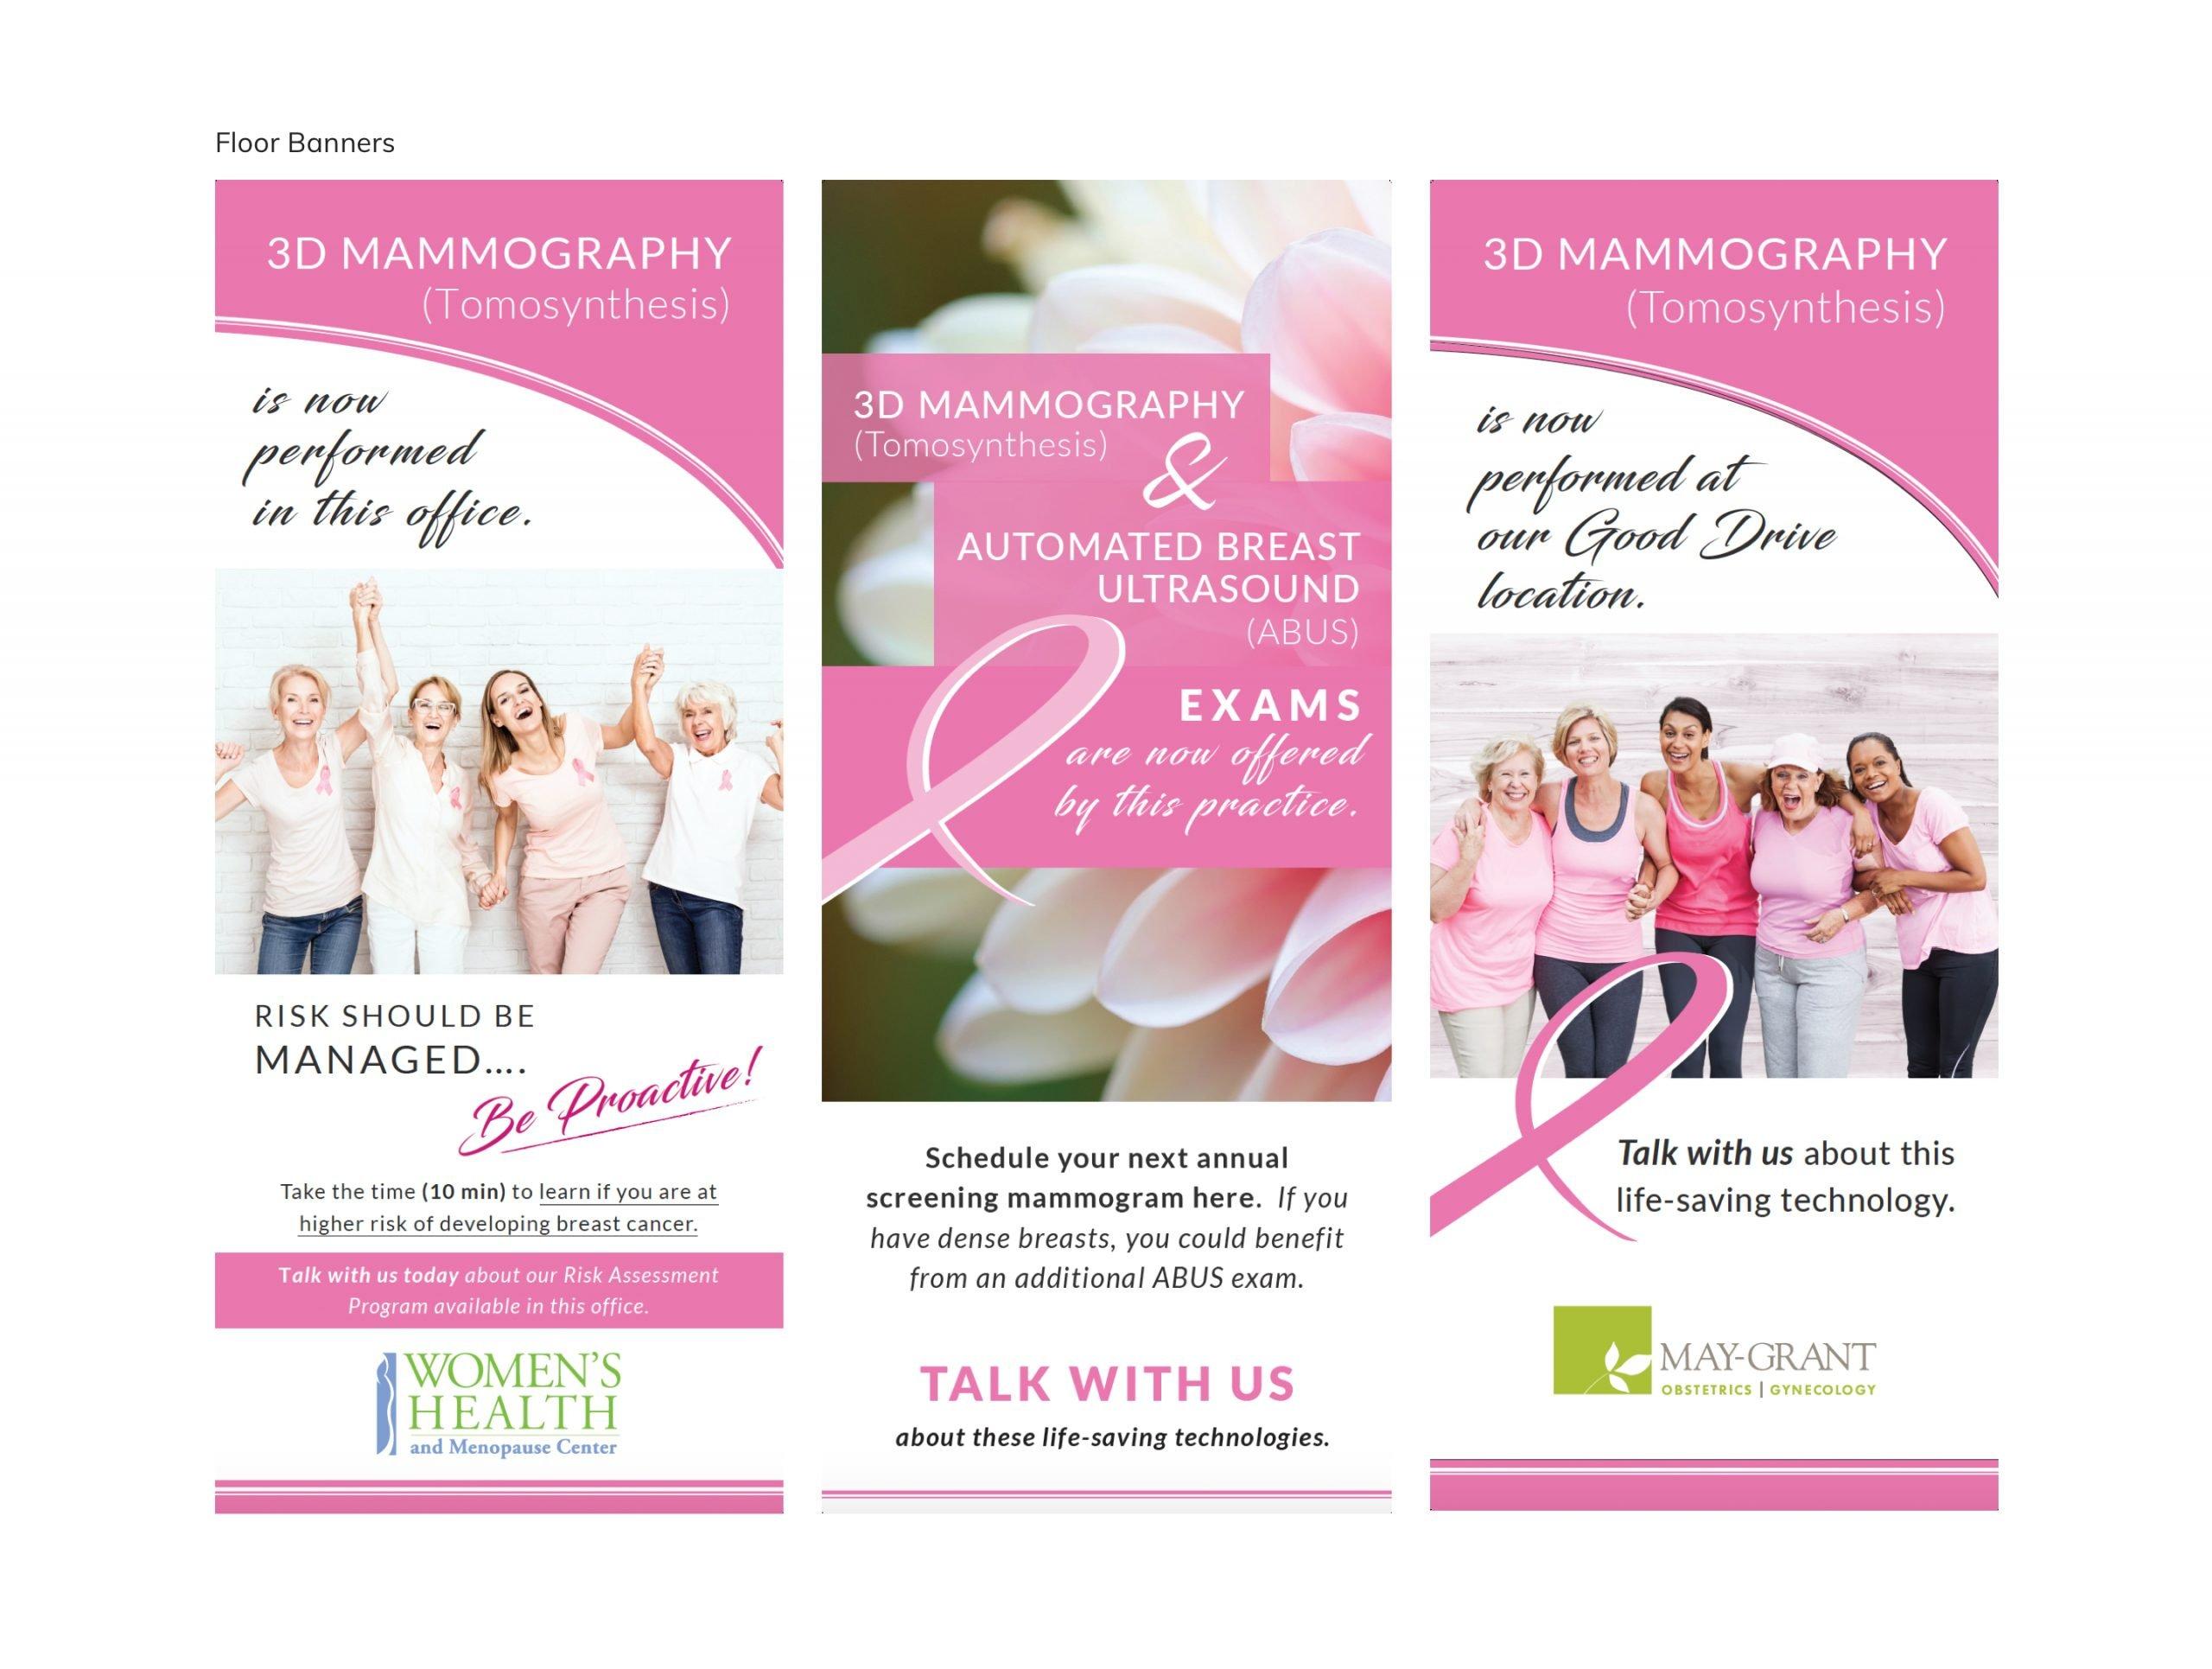 Onsite Mammography Floor Banner Designs